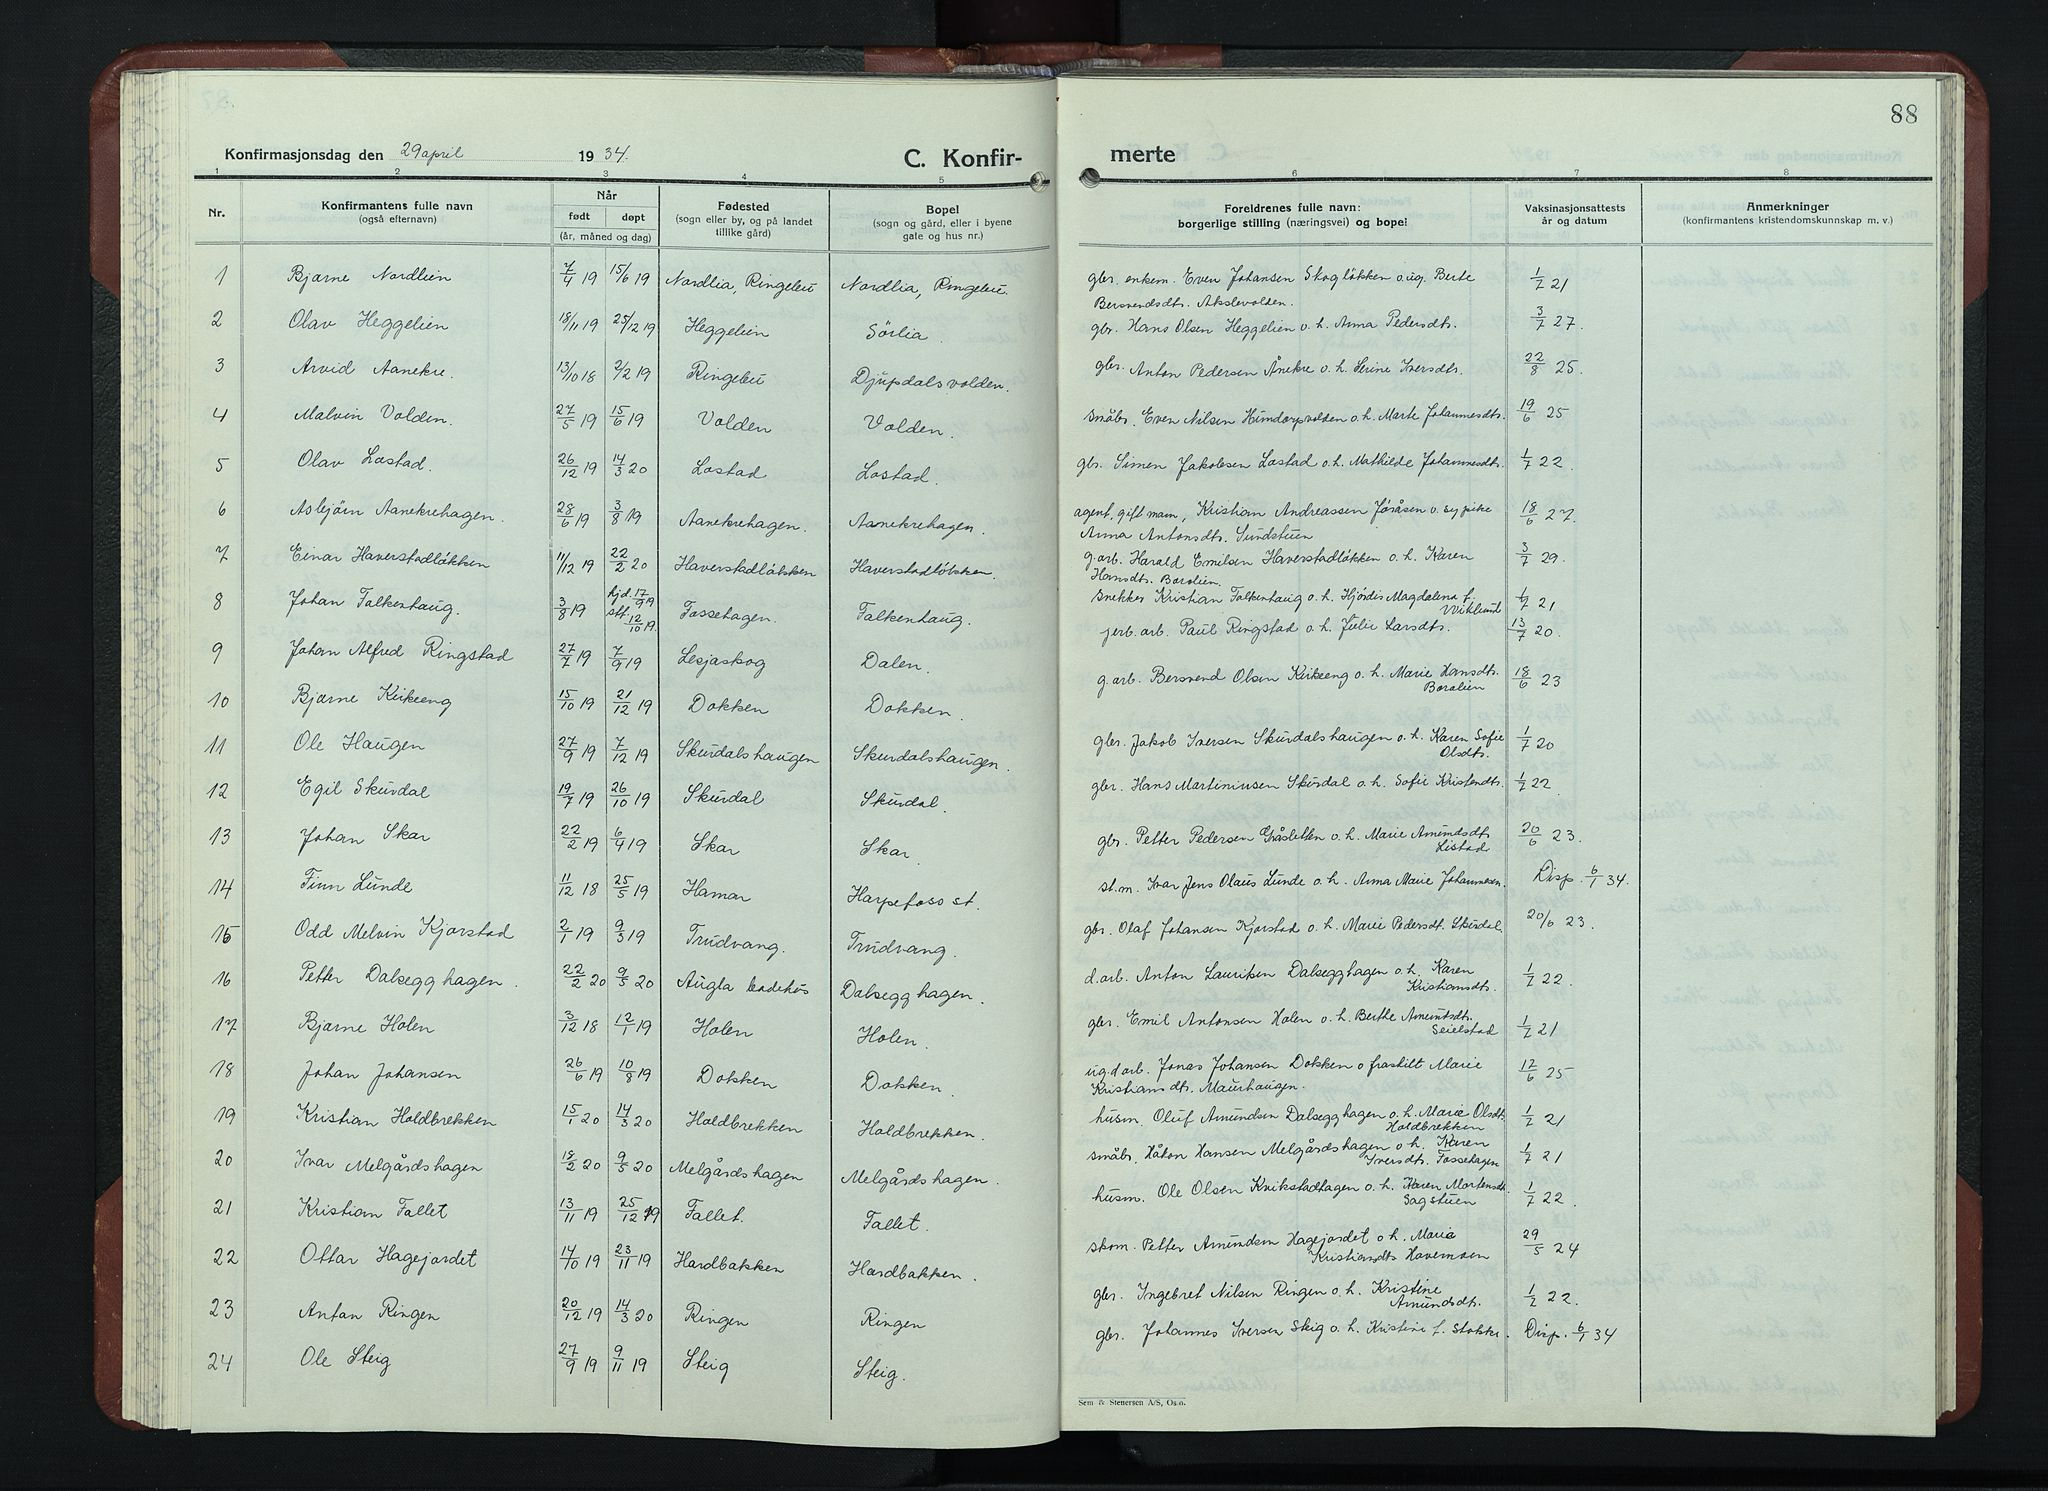 SAH, Sør-Fron prestekontor, H/Ha/Hab/L0006: Klokkerbok nr. 6, 1933-1948, s. 88